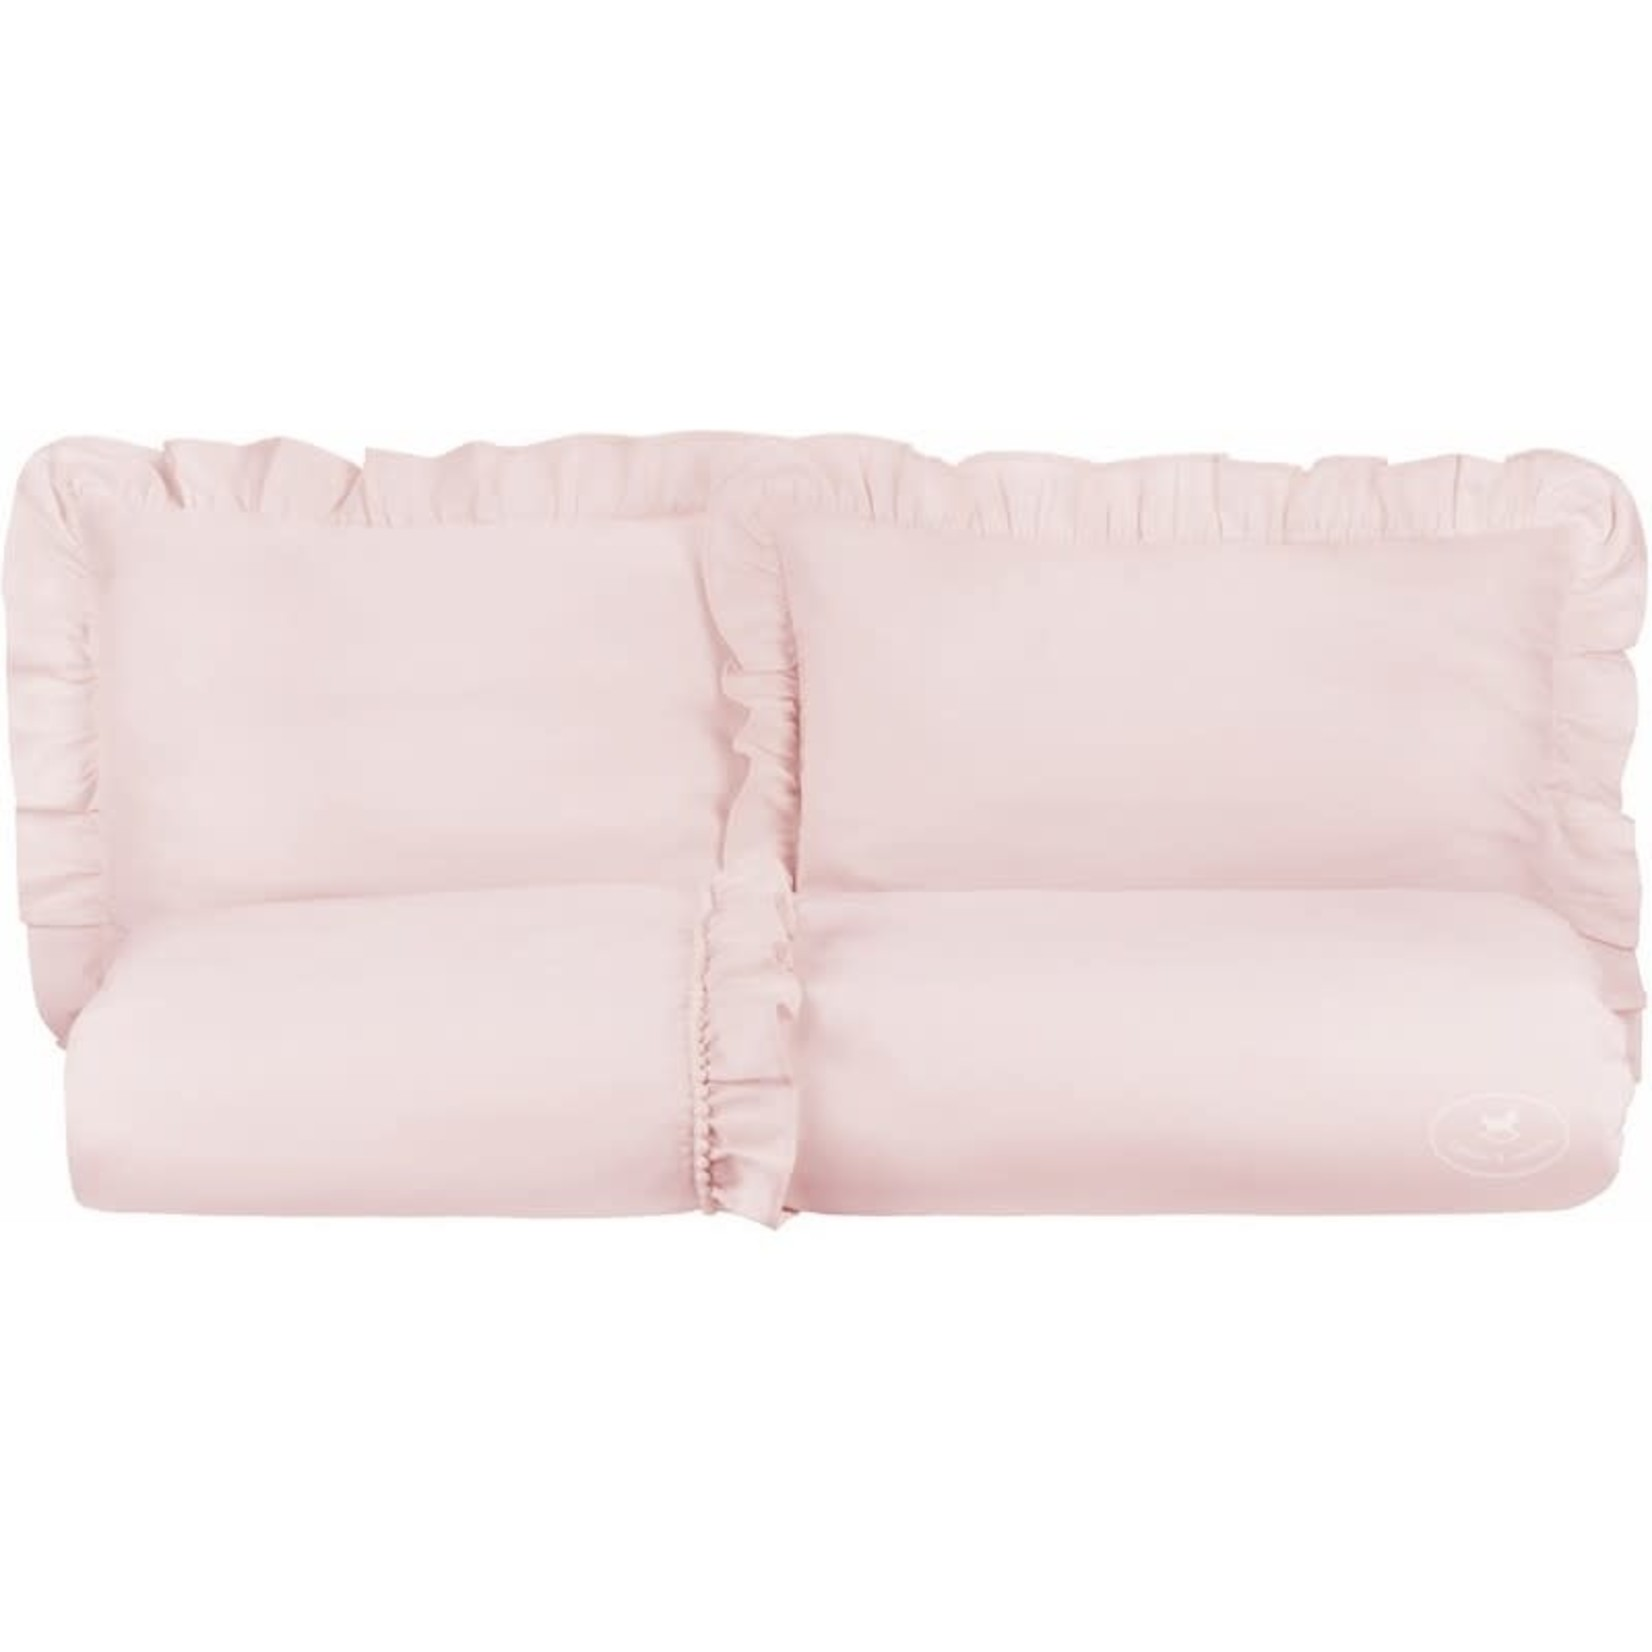 Cotton & Sweets Sheets Powder Pink Boho